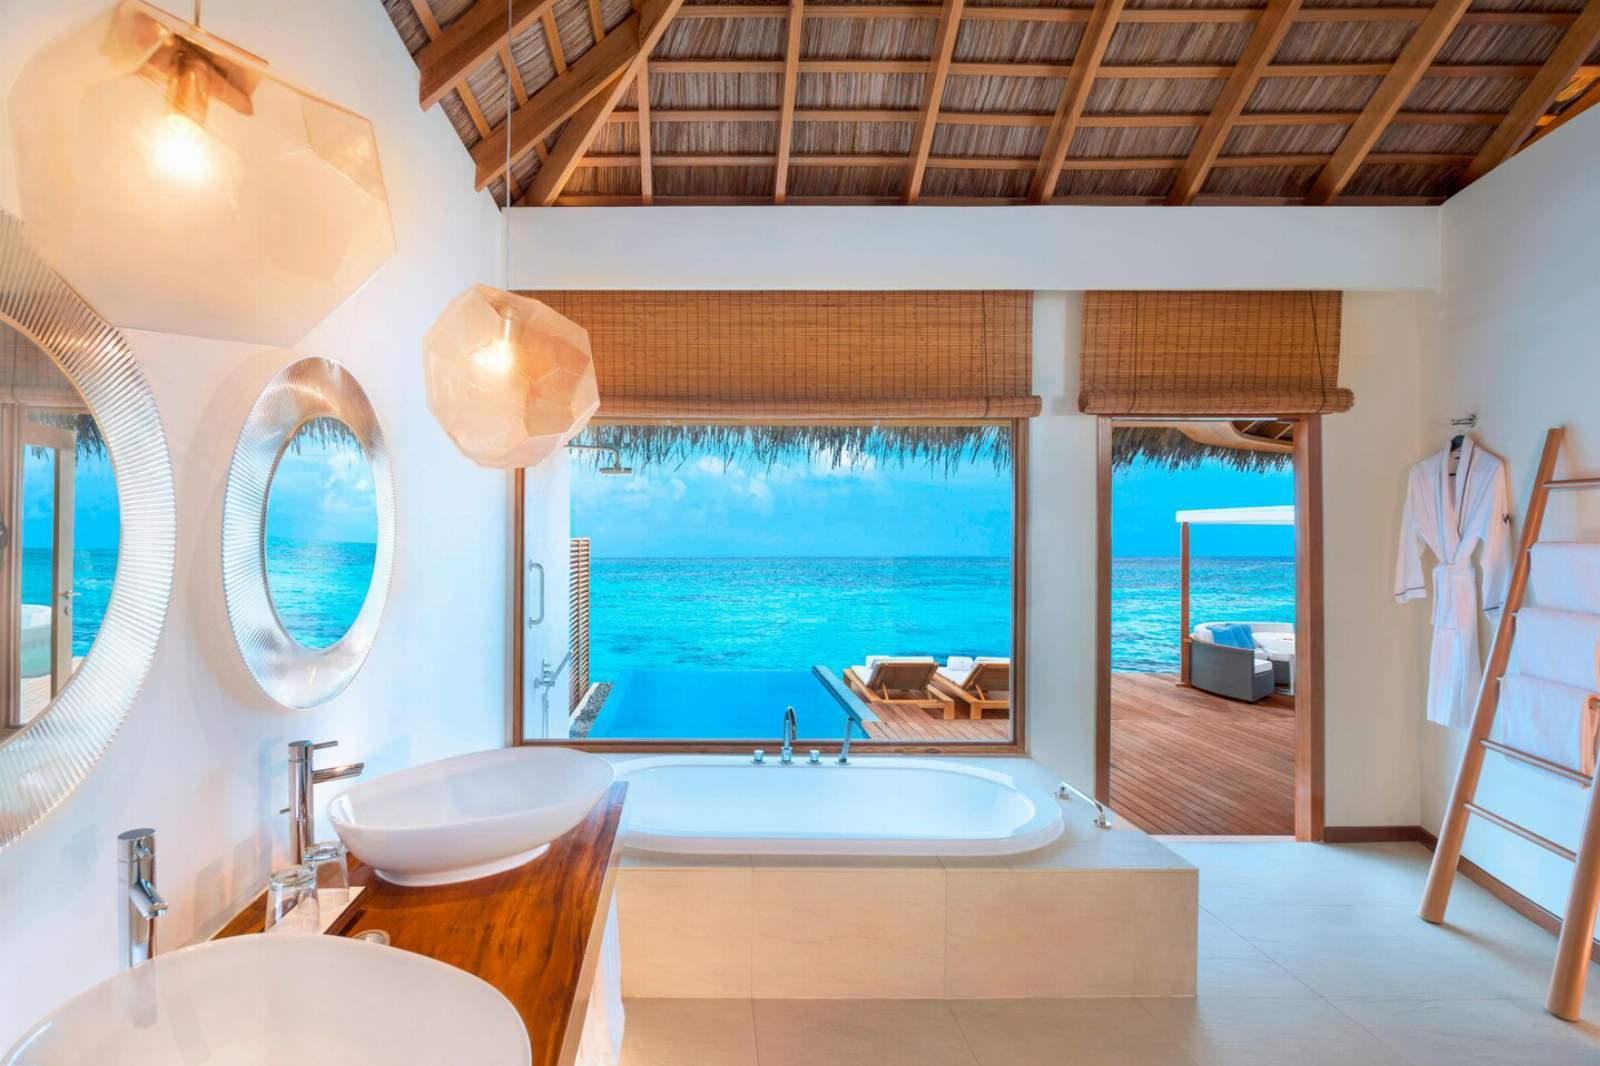 W Maldives - Wonderful Beach Oasis